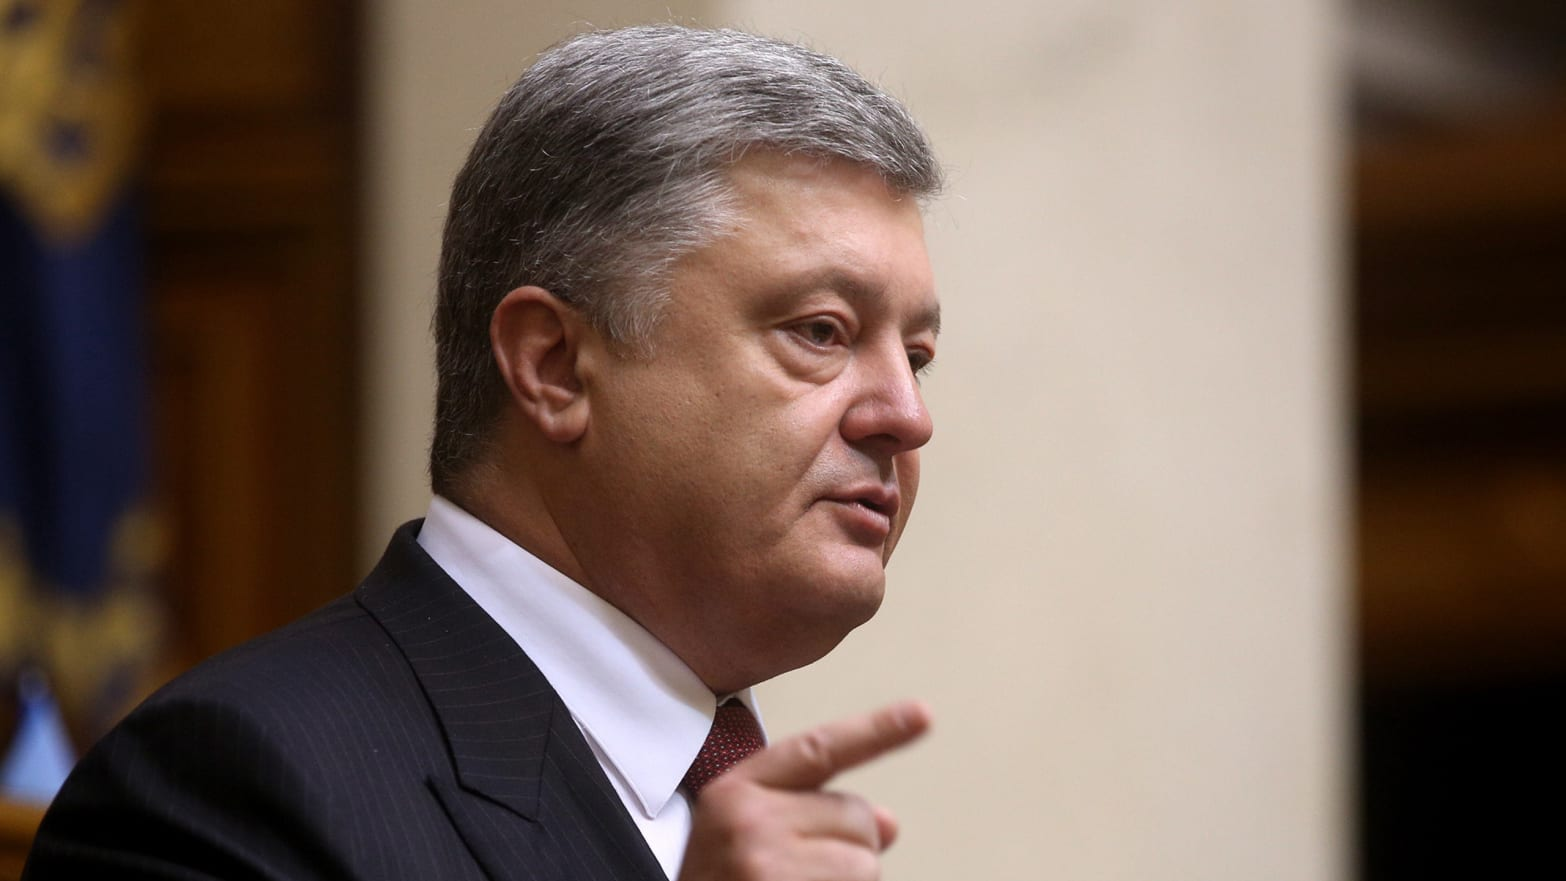 Ukraine's Poroshenko Denounces Putin's Aggression in No Uncertain Terms